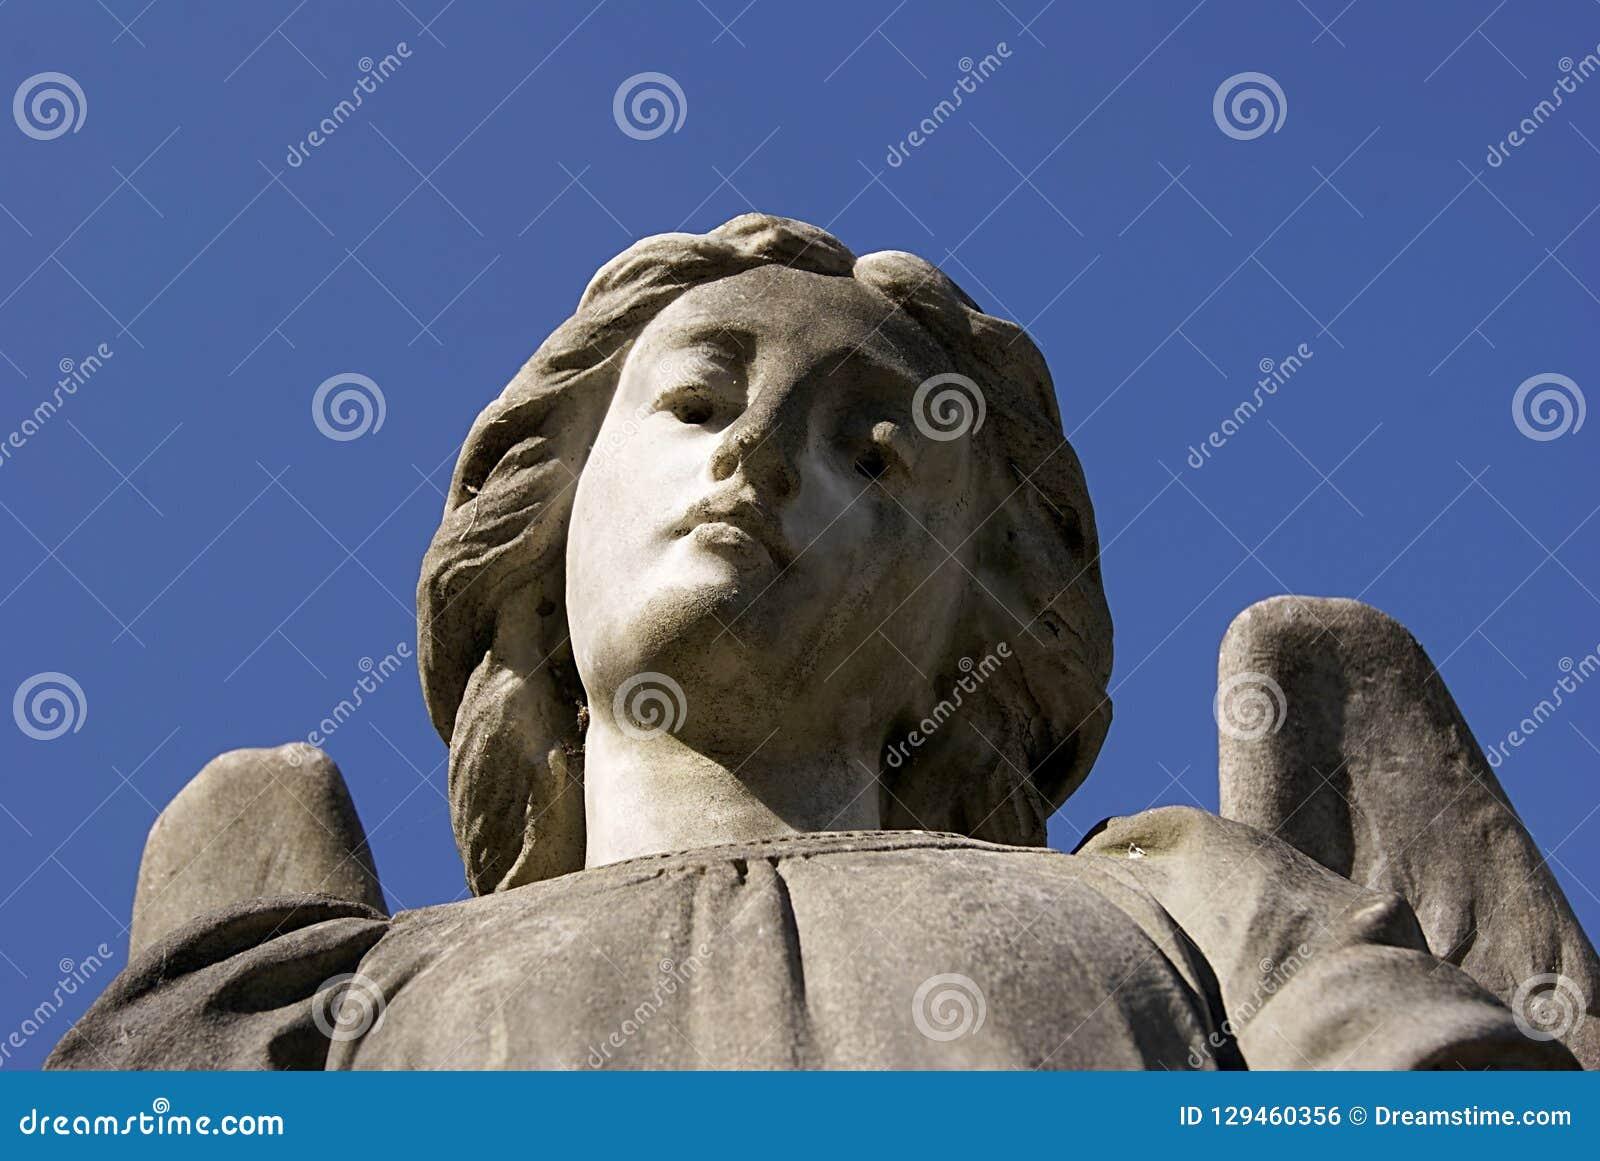 Compassionate look of beautiful ángel